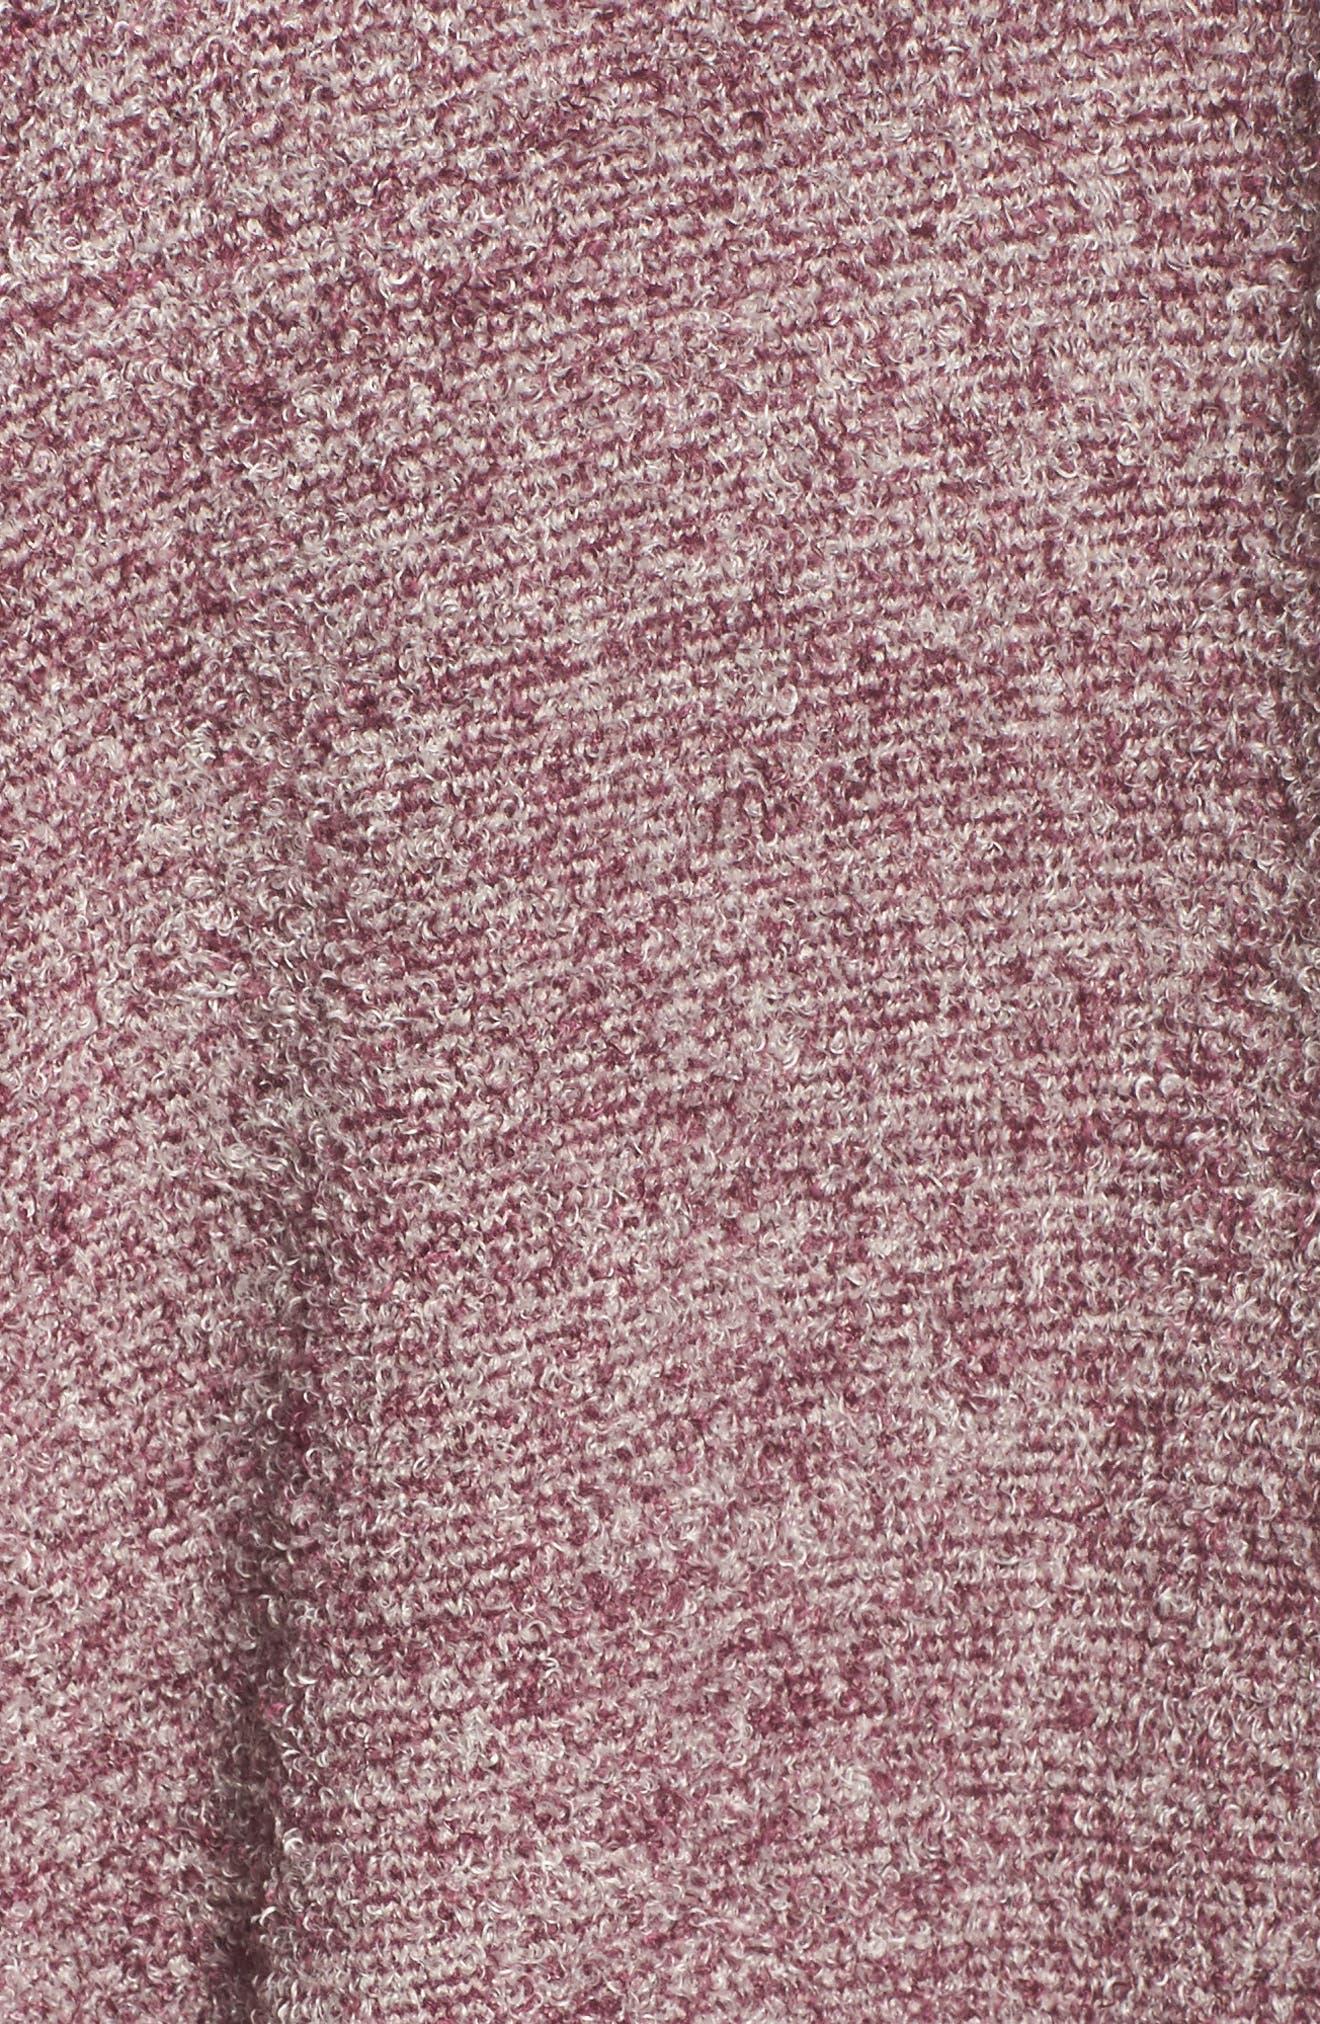 CozyChic Lite<sup>®</sup> Calypso Wrap Cardigan,                             Alternate thumbnail 6, color,                             Burgundy/ Stone